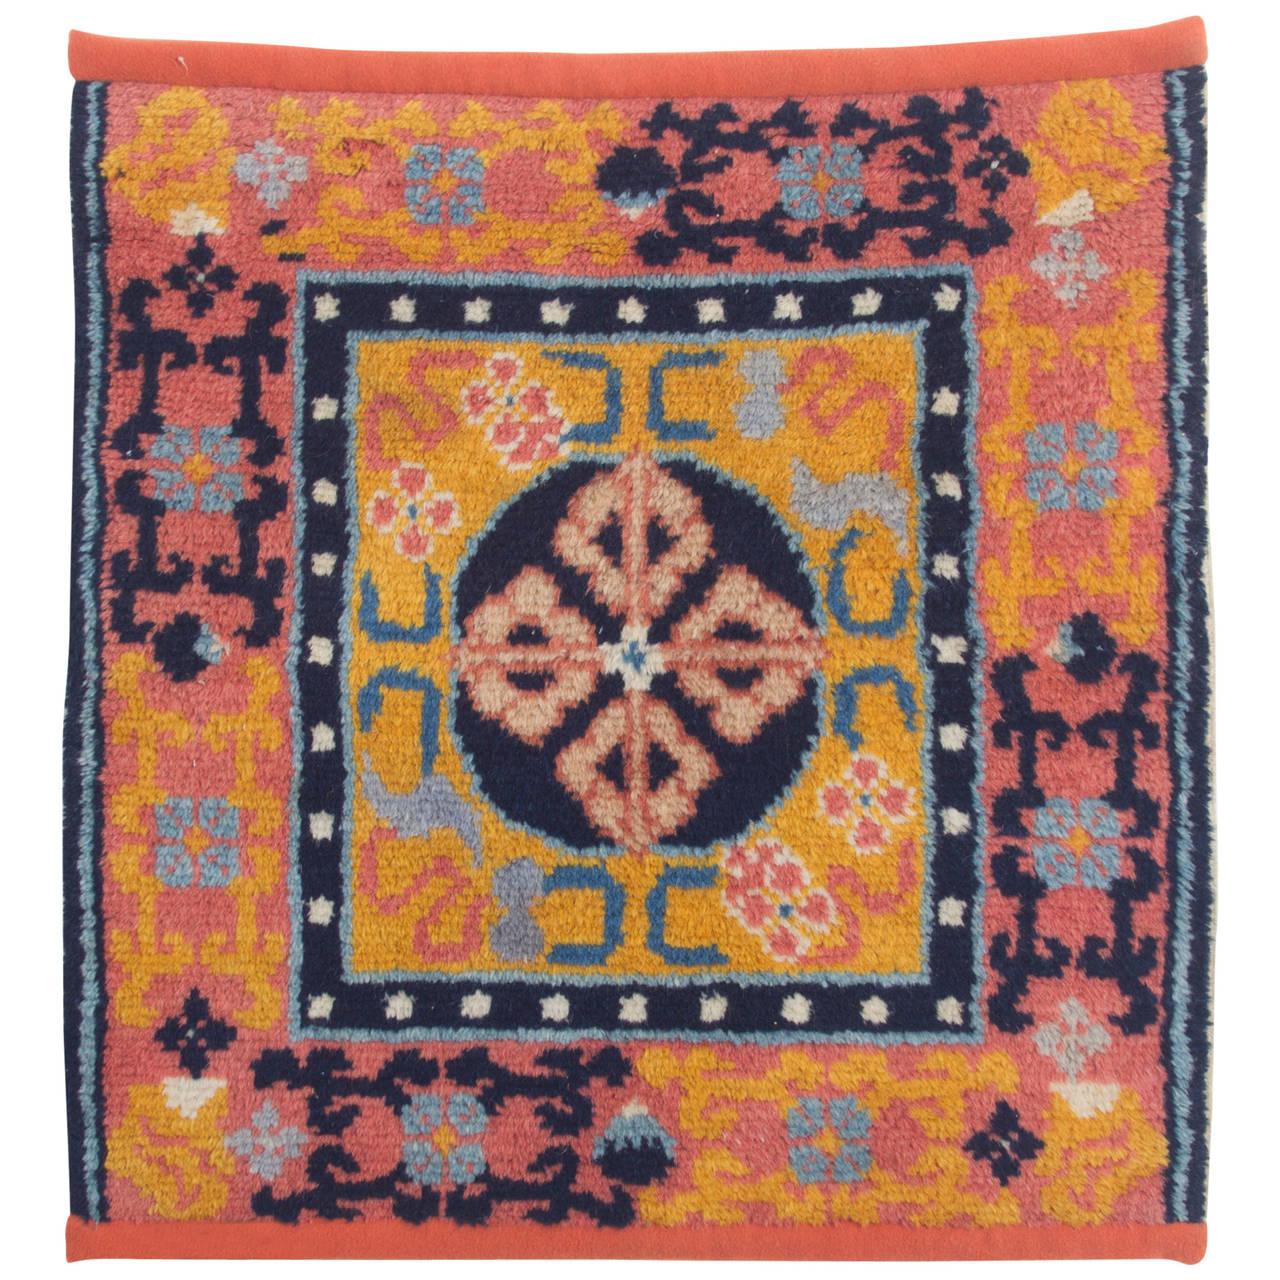 Antique Tibetan Rug: Antique Tibetan 19th Century Meditation Mat At 1stdibs